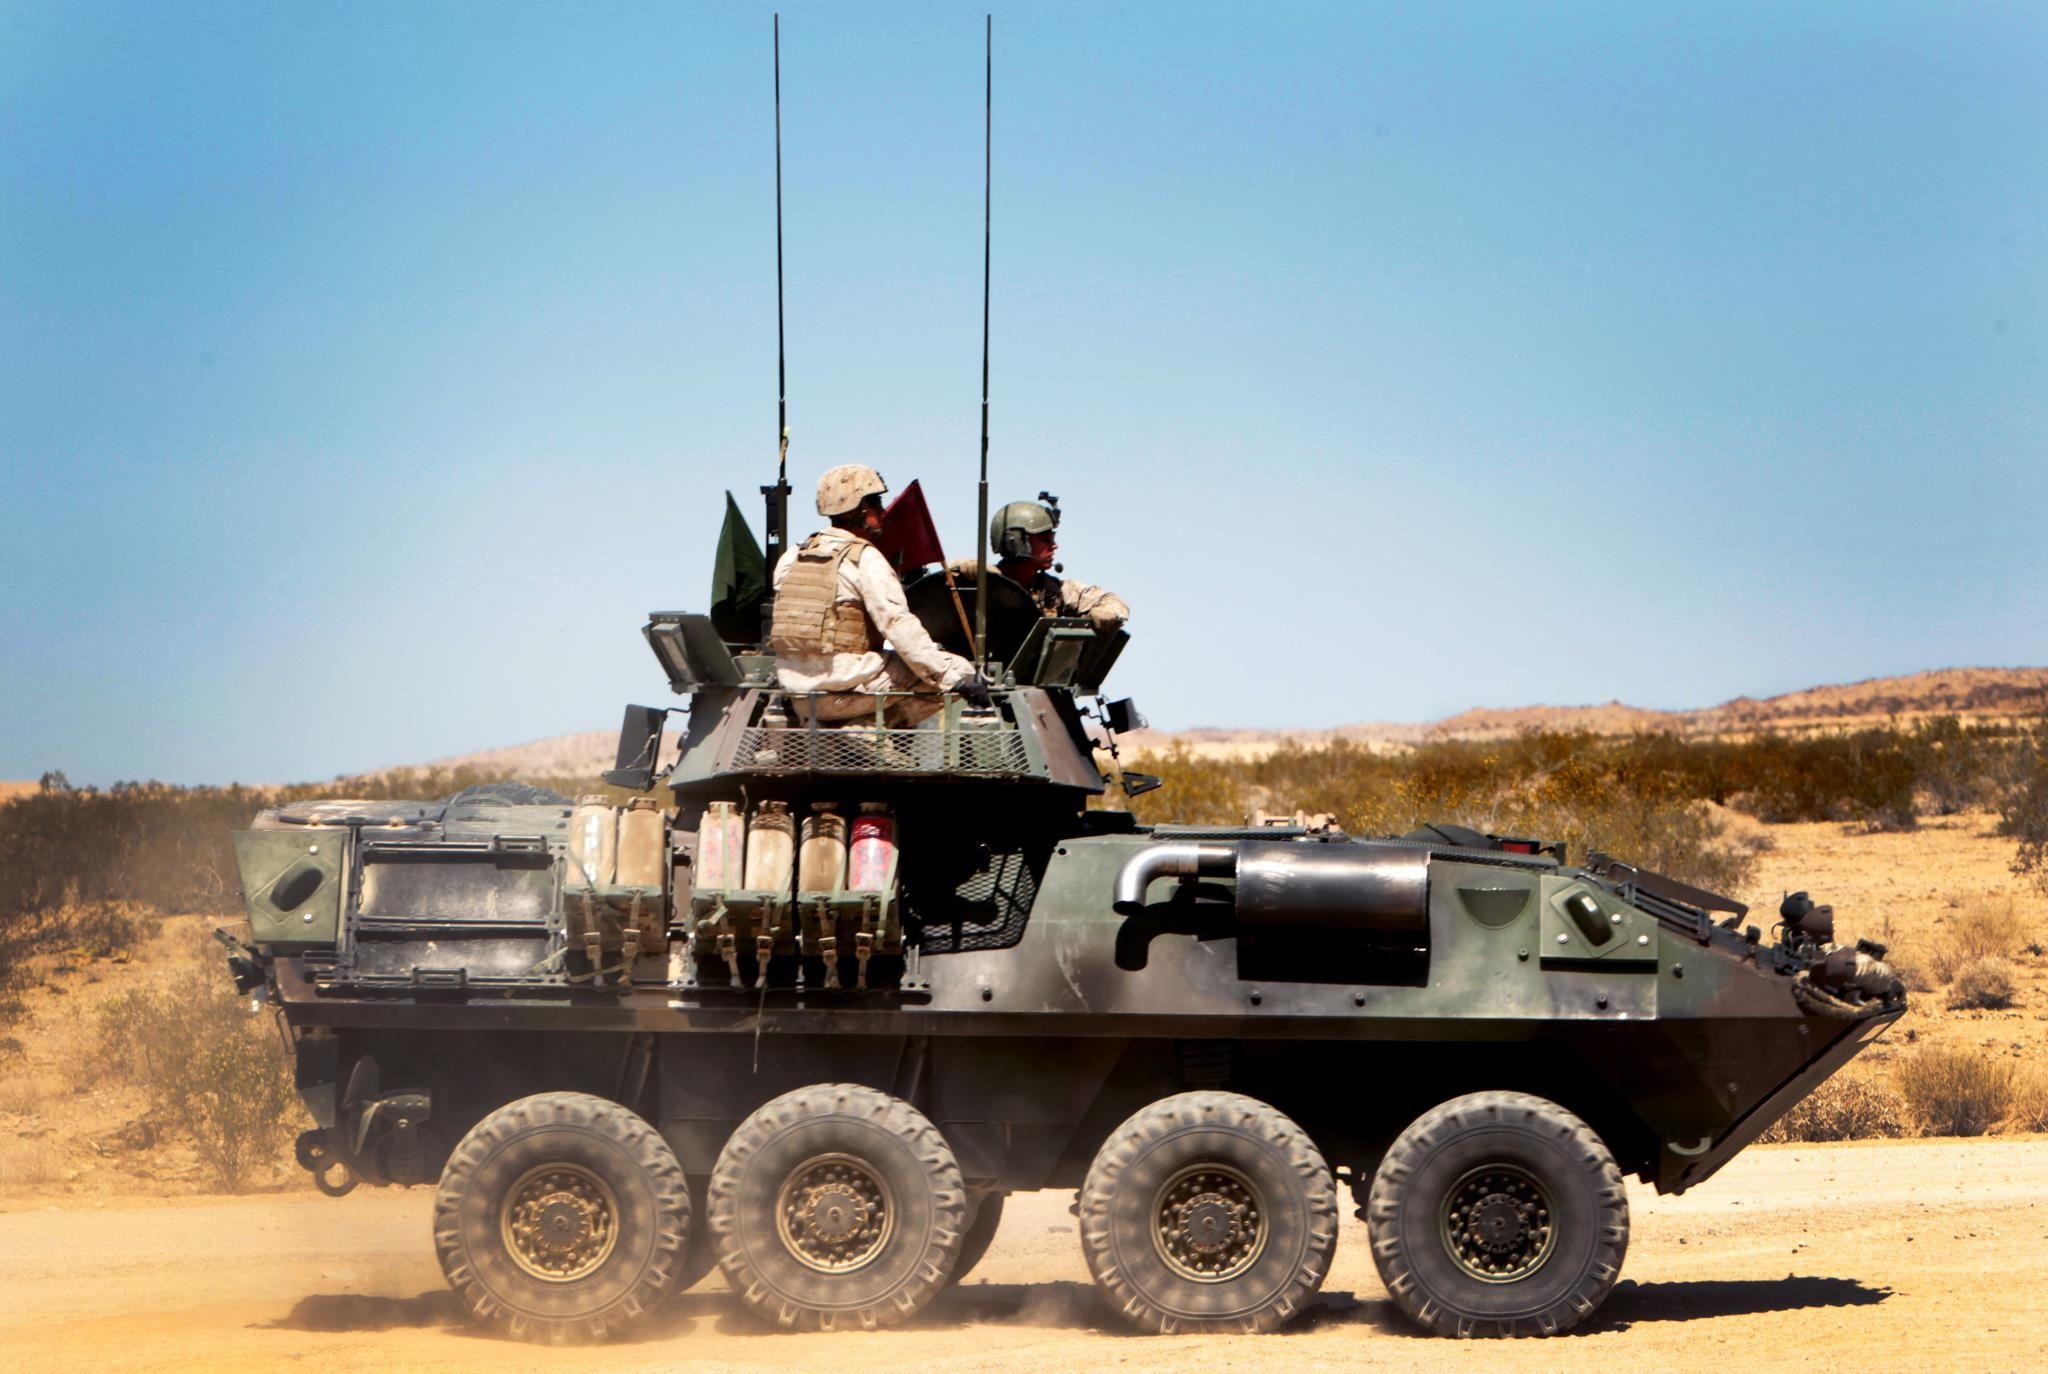 Usmc Light Armored Vehicle Lav Tanks Military Military Vehicles Marine Corps